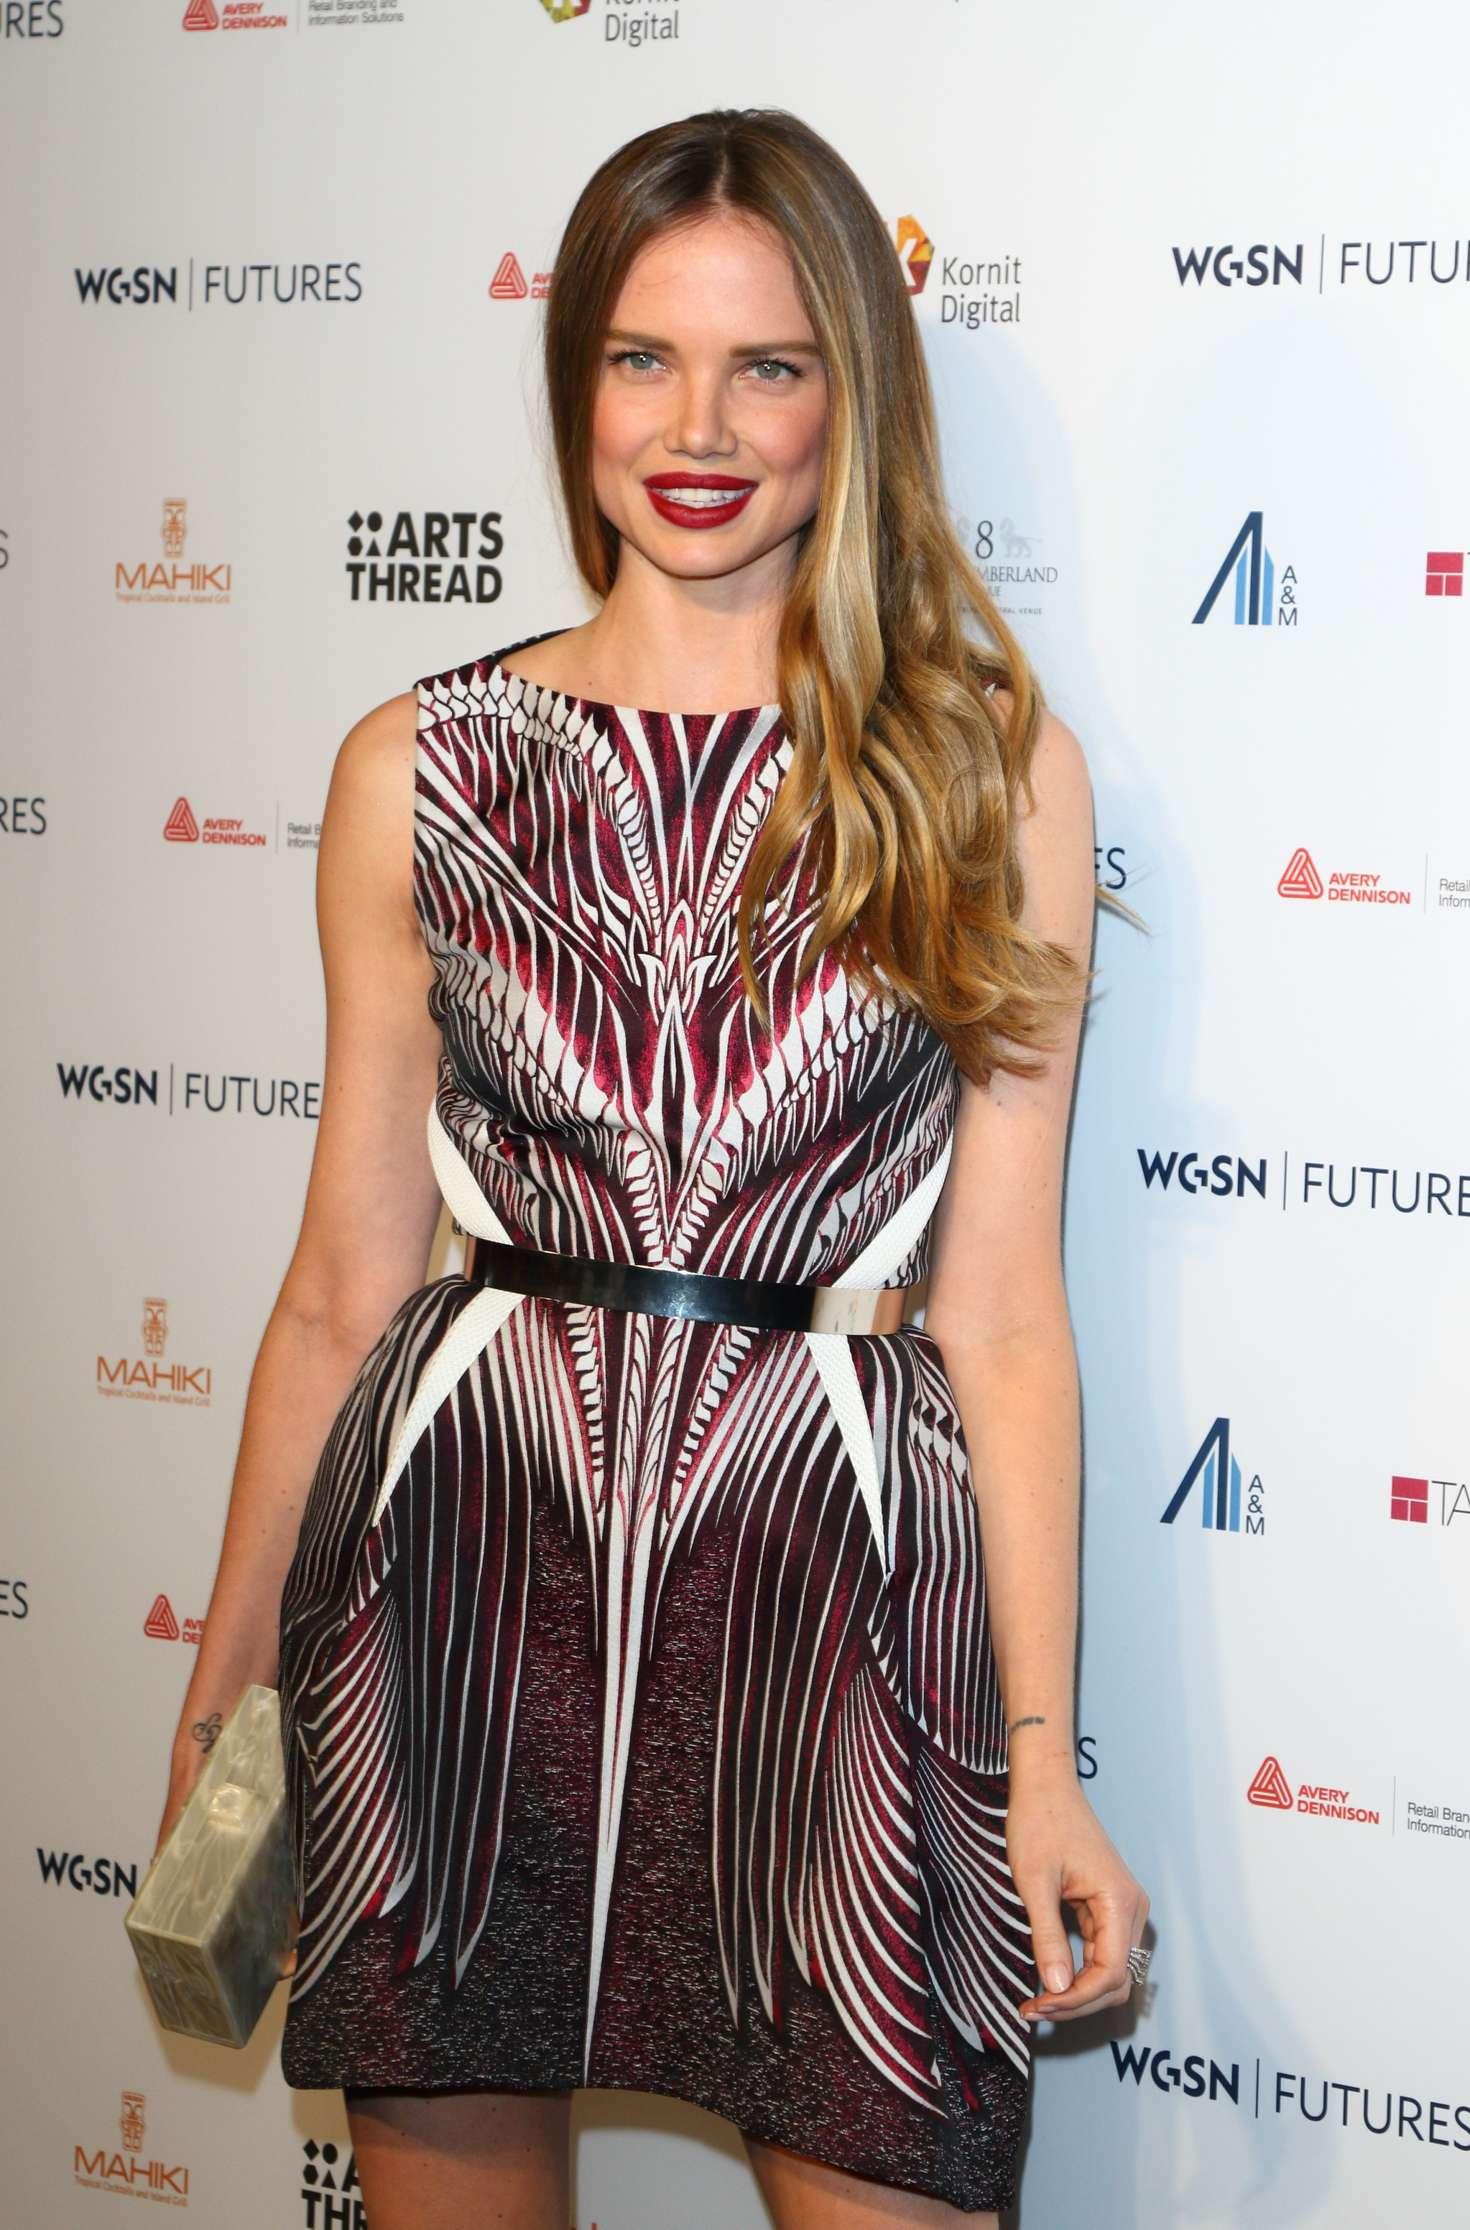 Alicia Rountree - WGSN Futures Awards 2016 in London